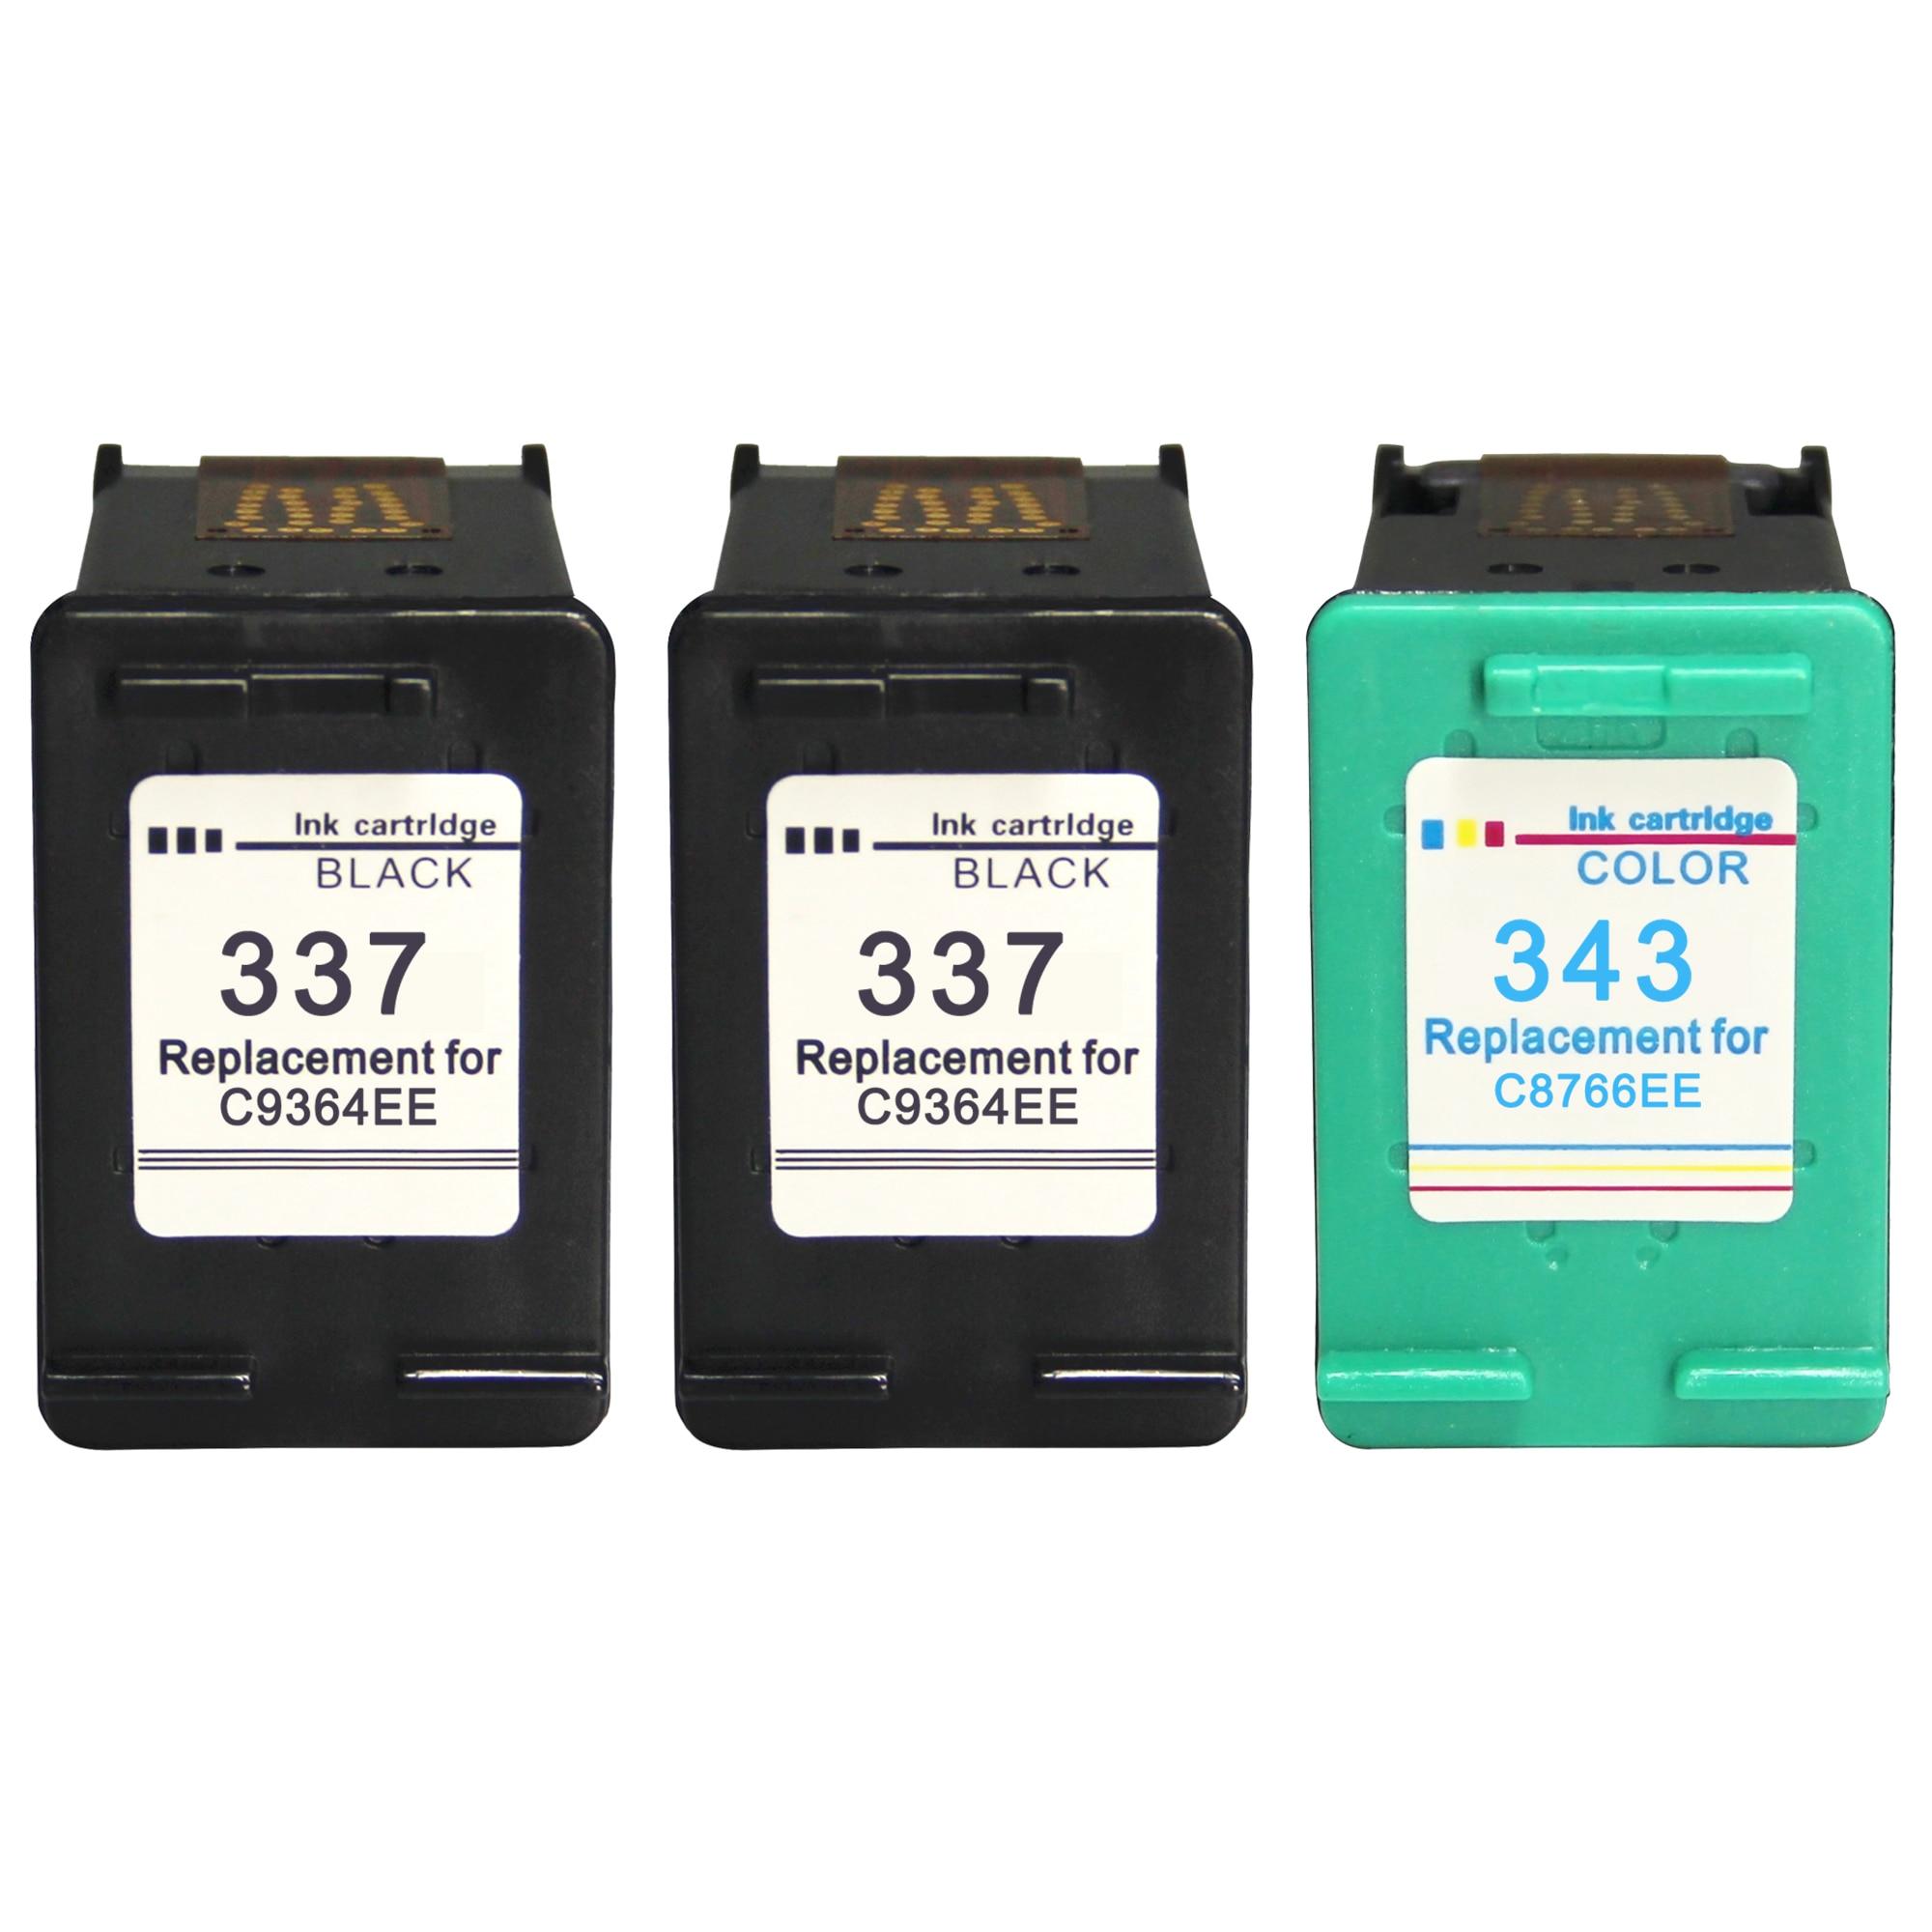 Cartucho de tinta HP 343 337 remanufacturado para HP 337 hp 343 para HP Photosmart 2575 8050 C4180 D5160 Deskjet 6940 D4160 hp PSC 1500